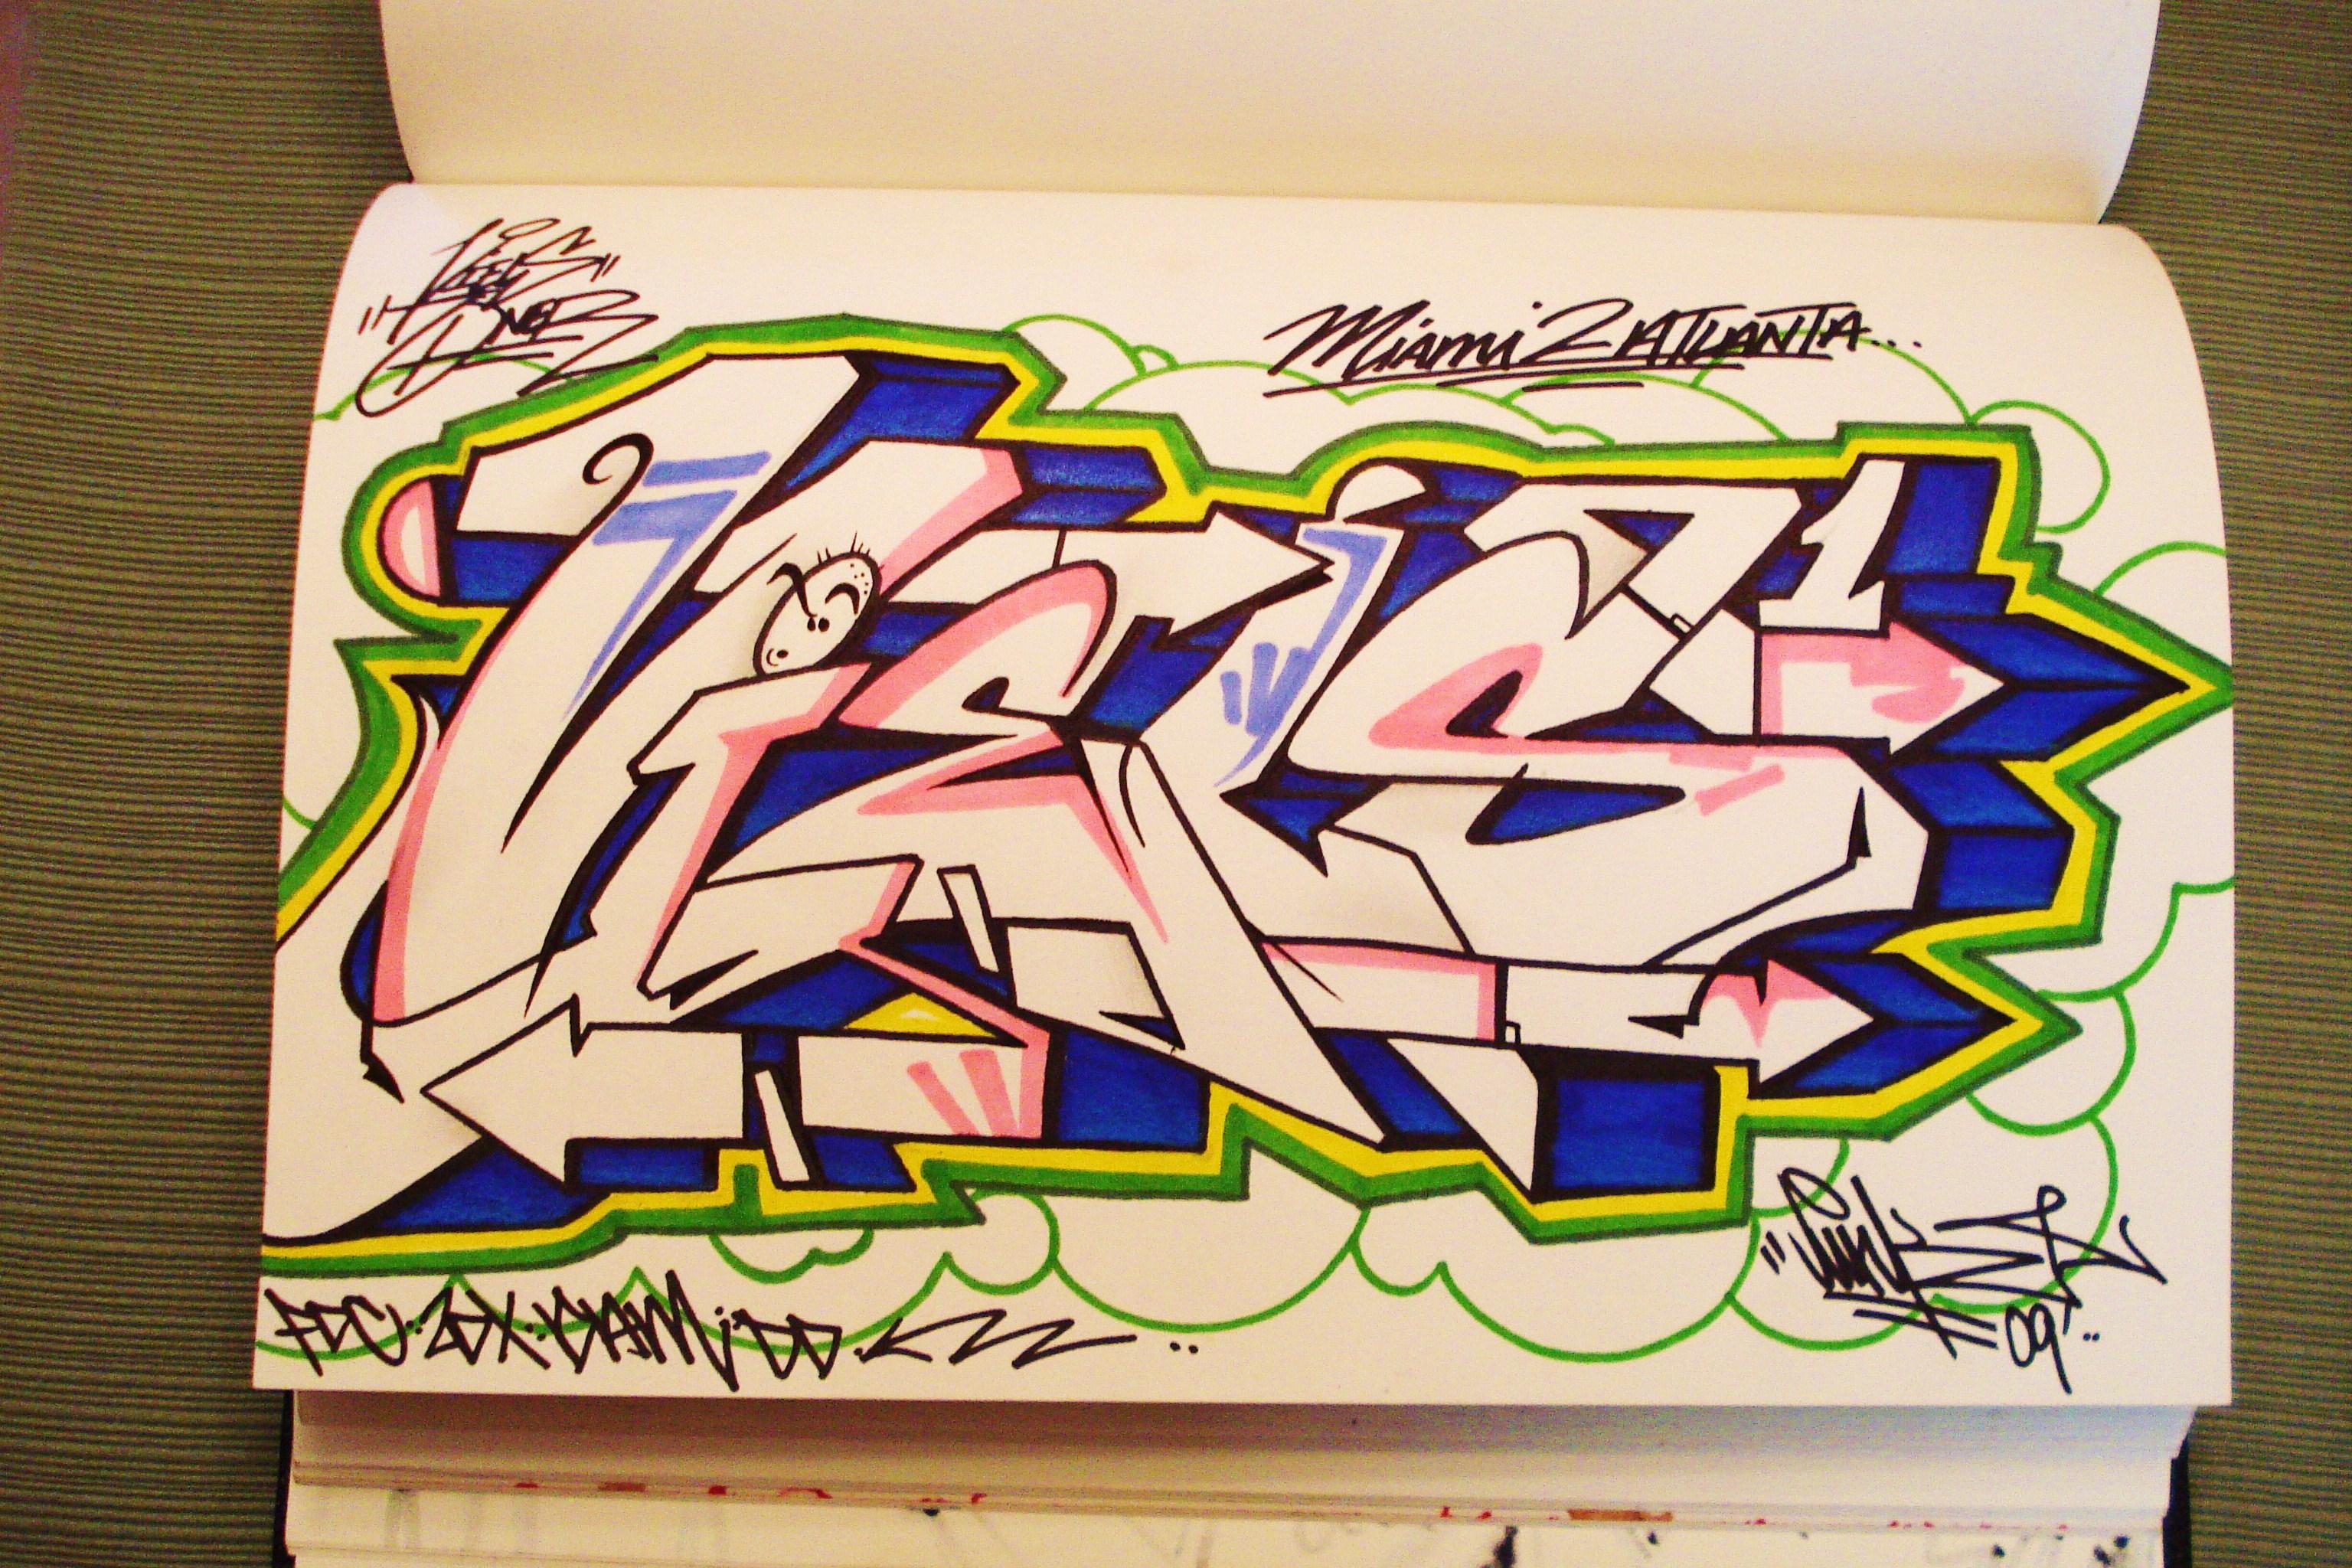 Viels sketch by Junk